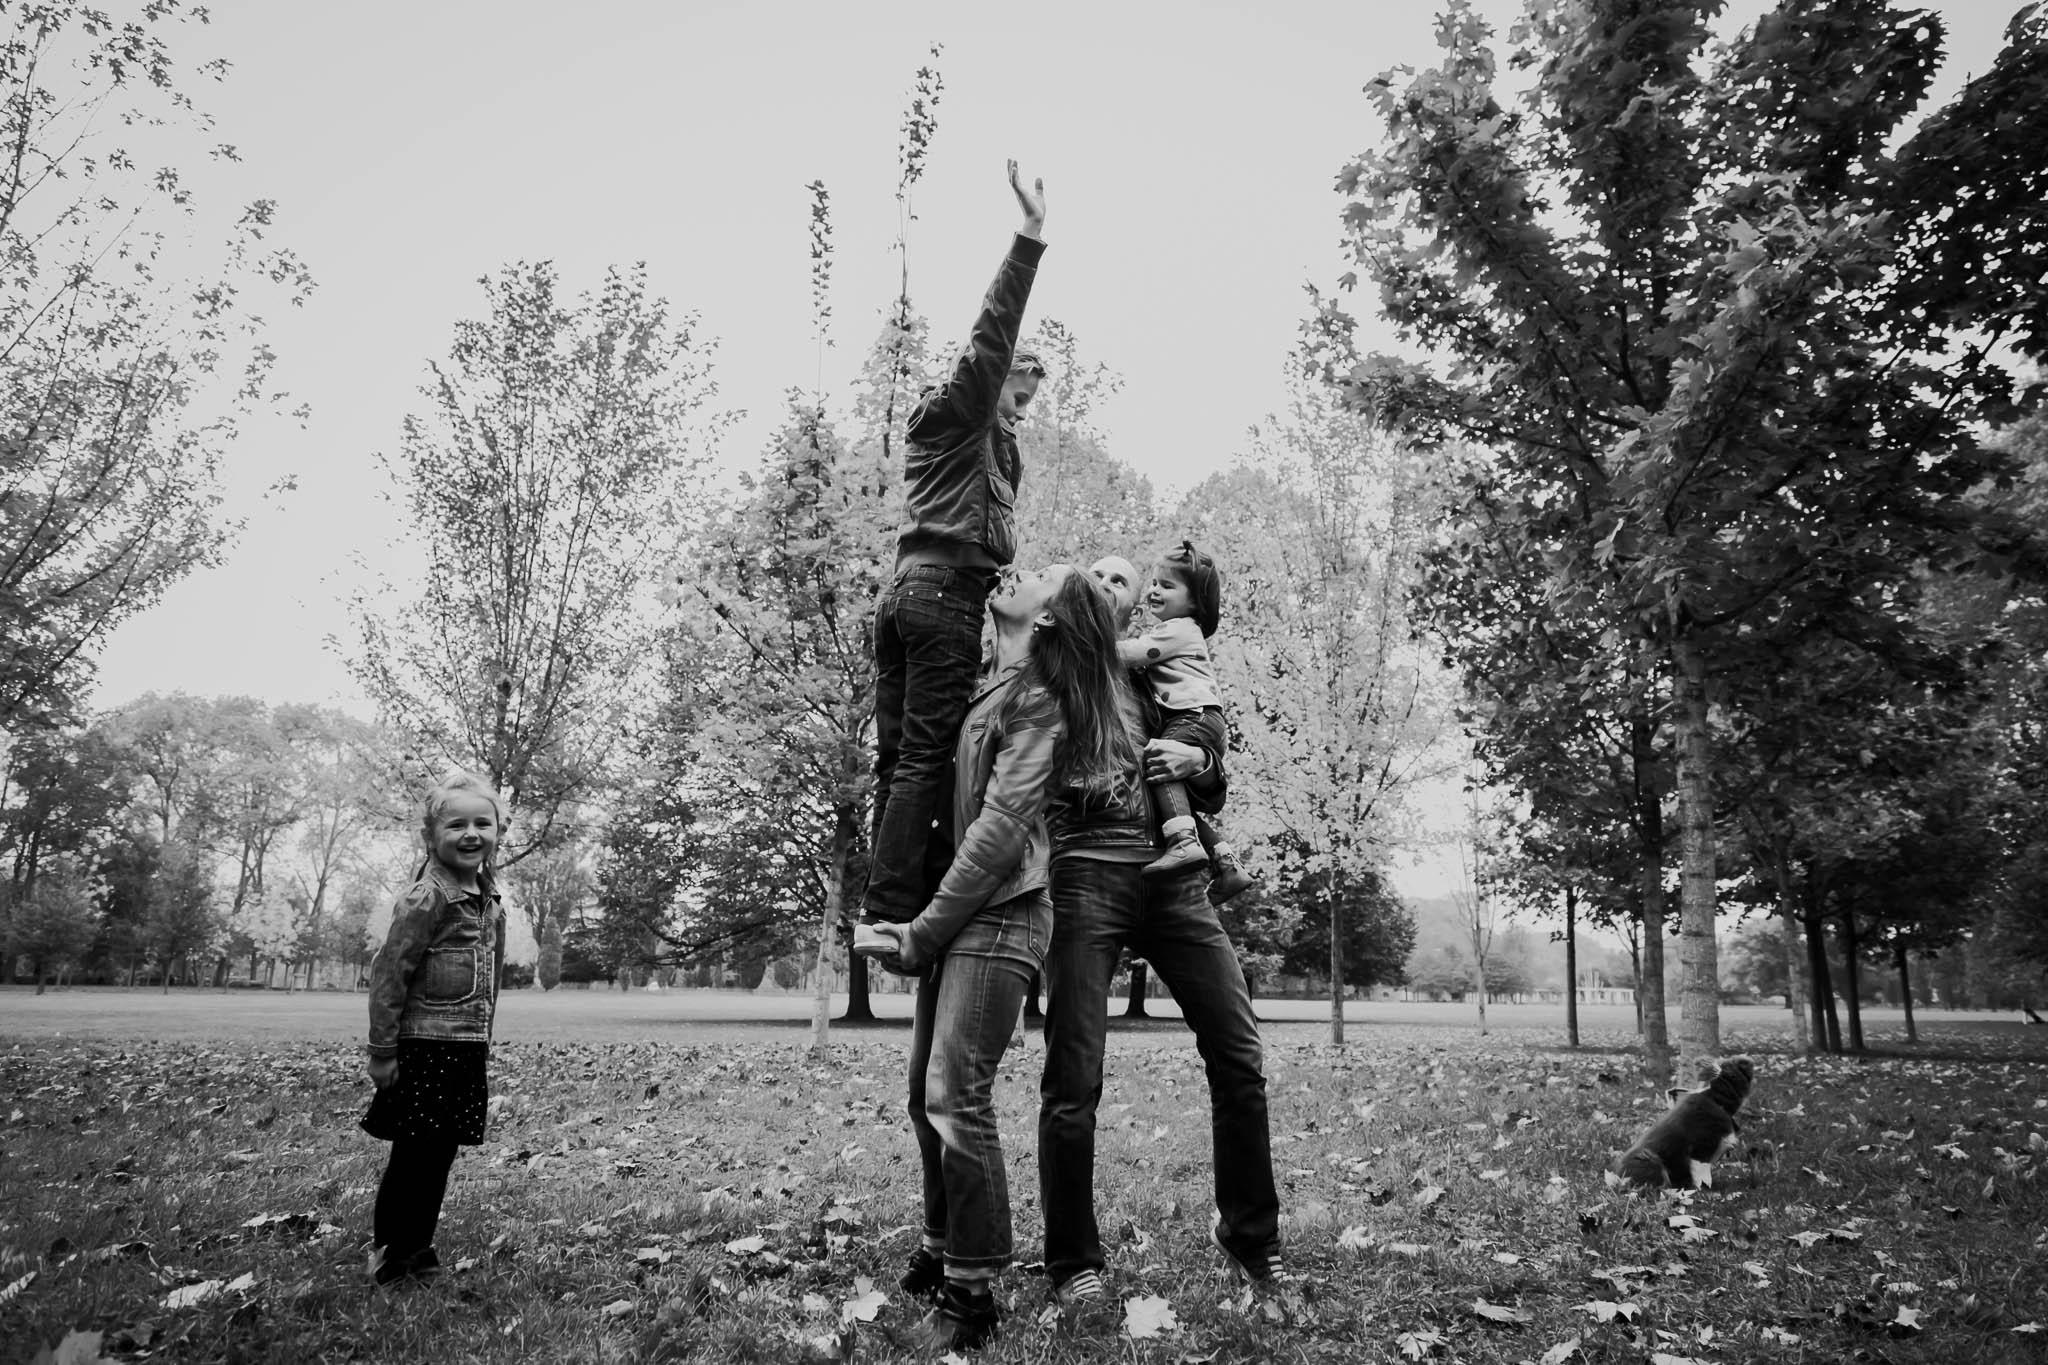 famille-lyon-parc-ingold-5.jpg